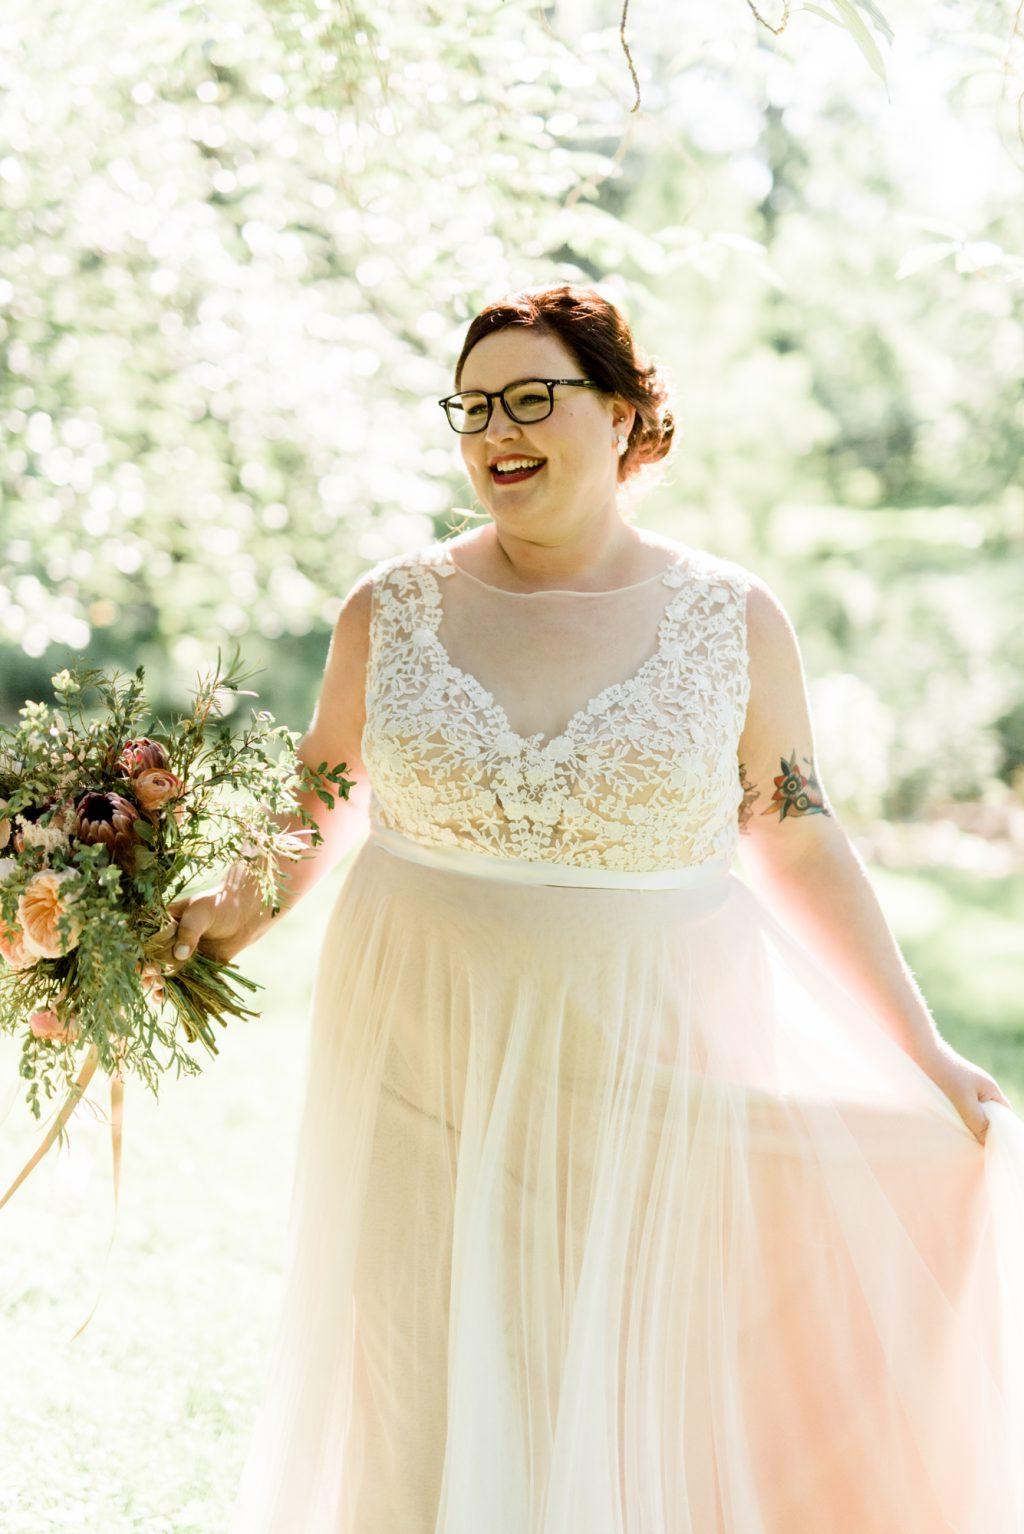 haley-richter-photo-west-chester-summer-wedding-boxcar-brewery-143